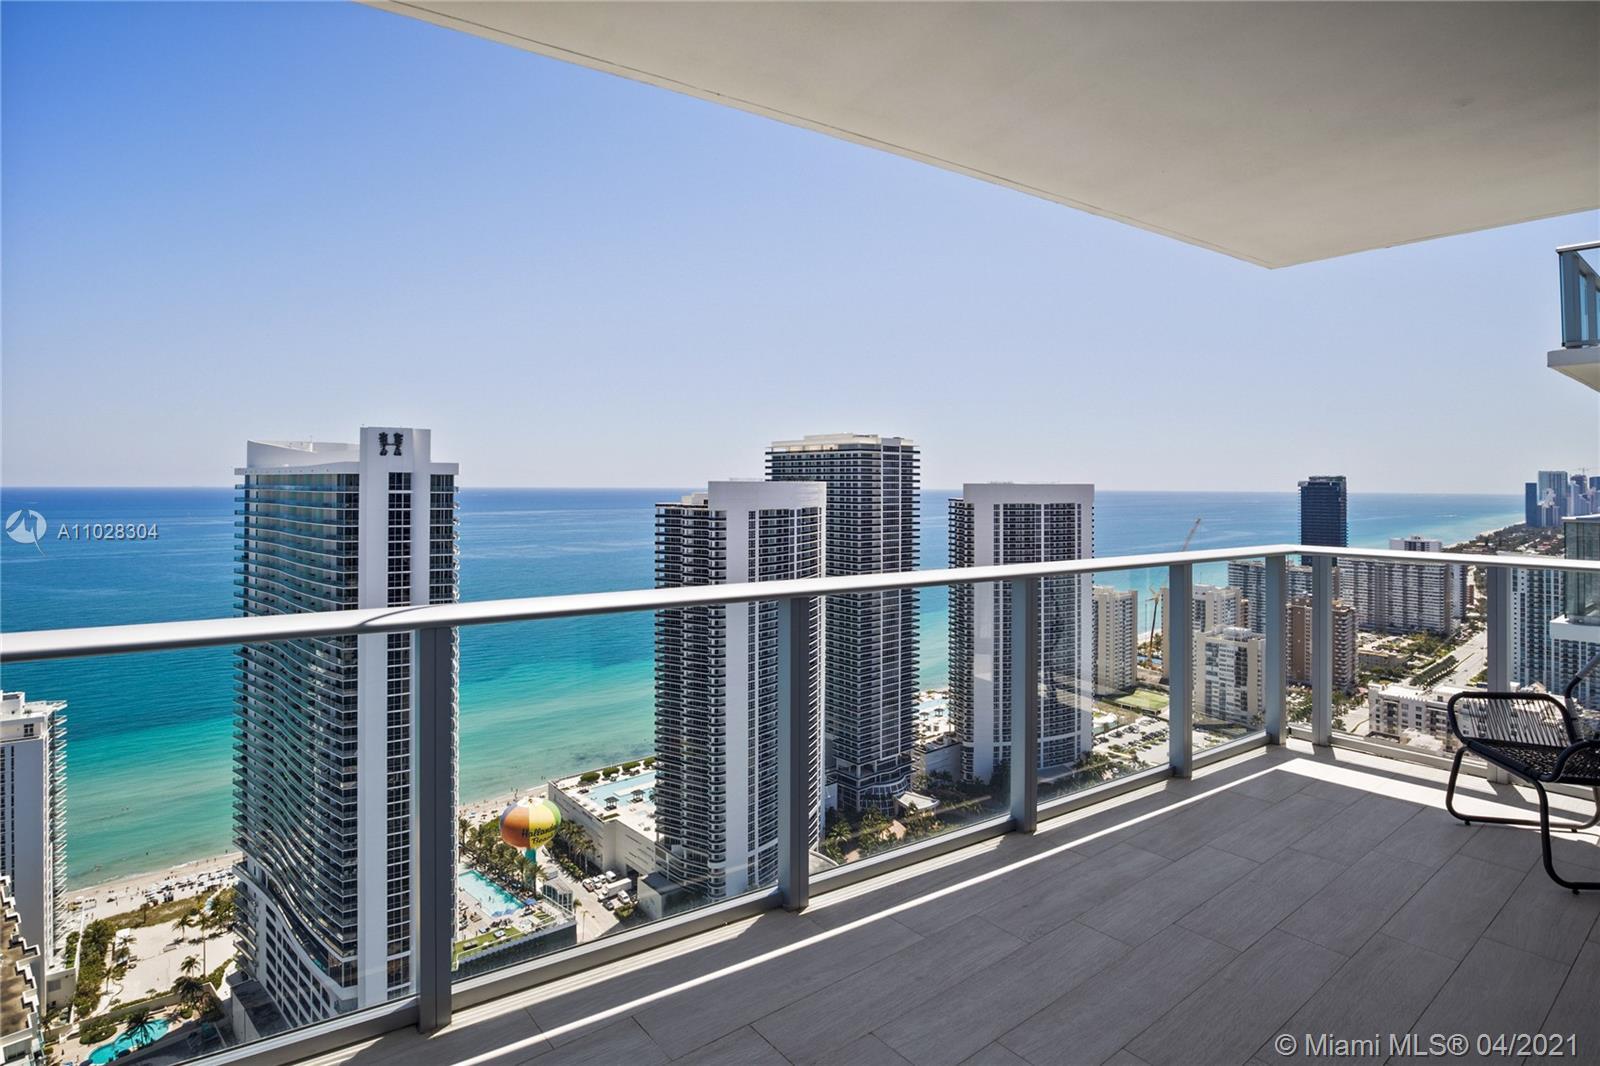 4010 S Ocean Dr #t4201 Property Photo 1